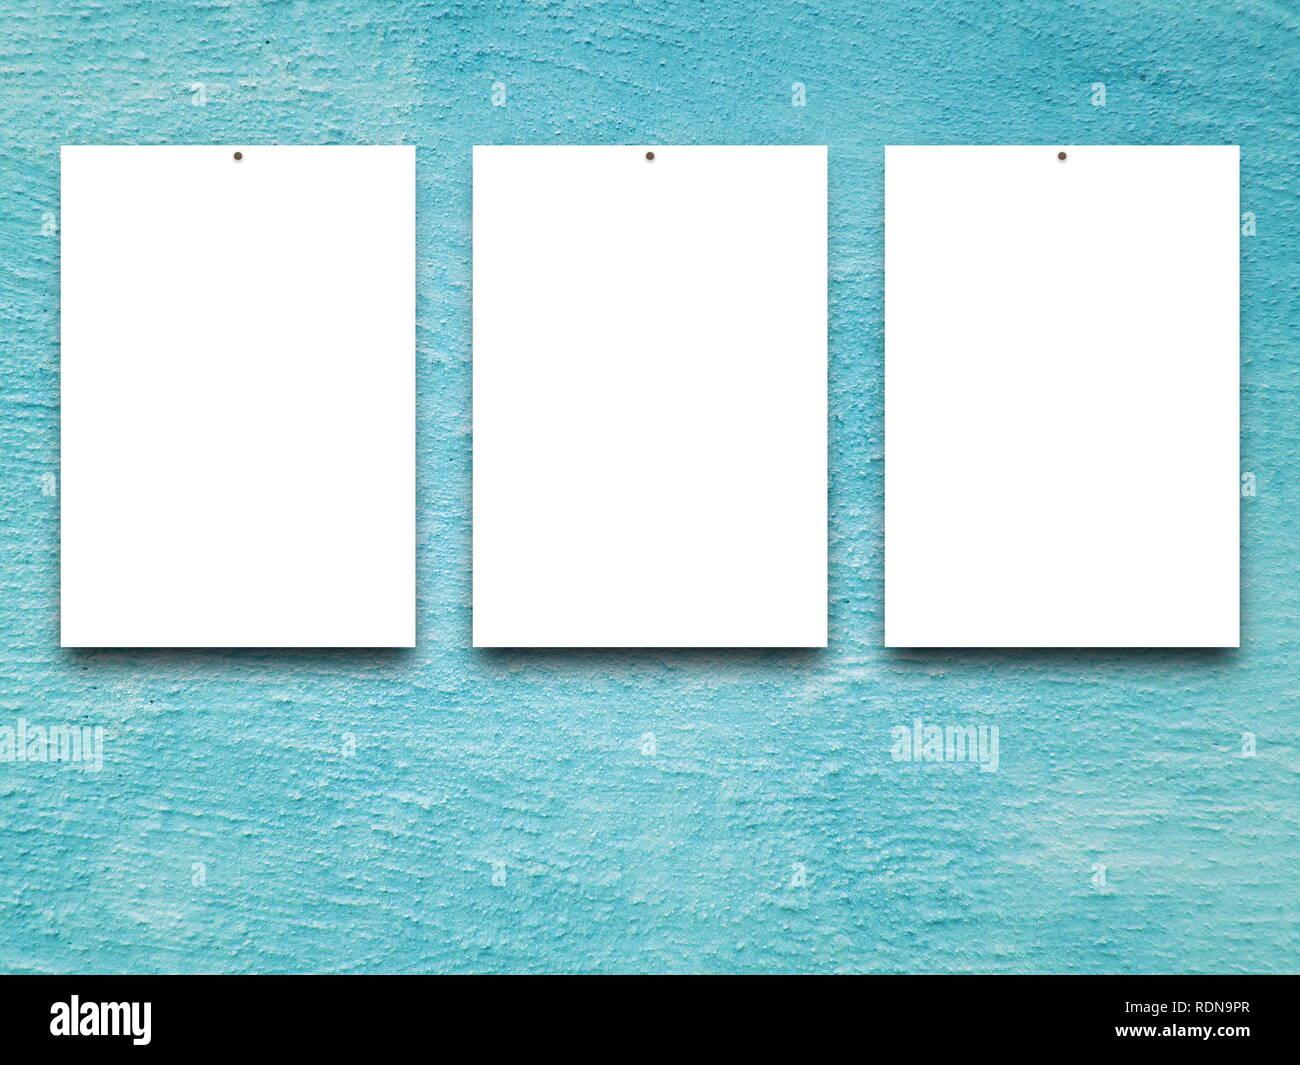 Three blank frames on aqua concrete wall background - Stock Image